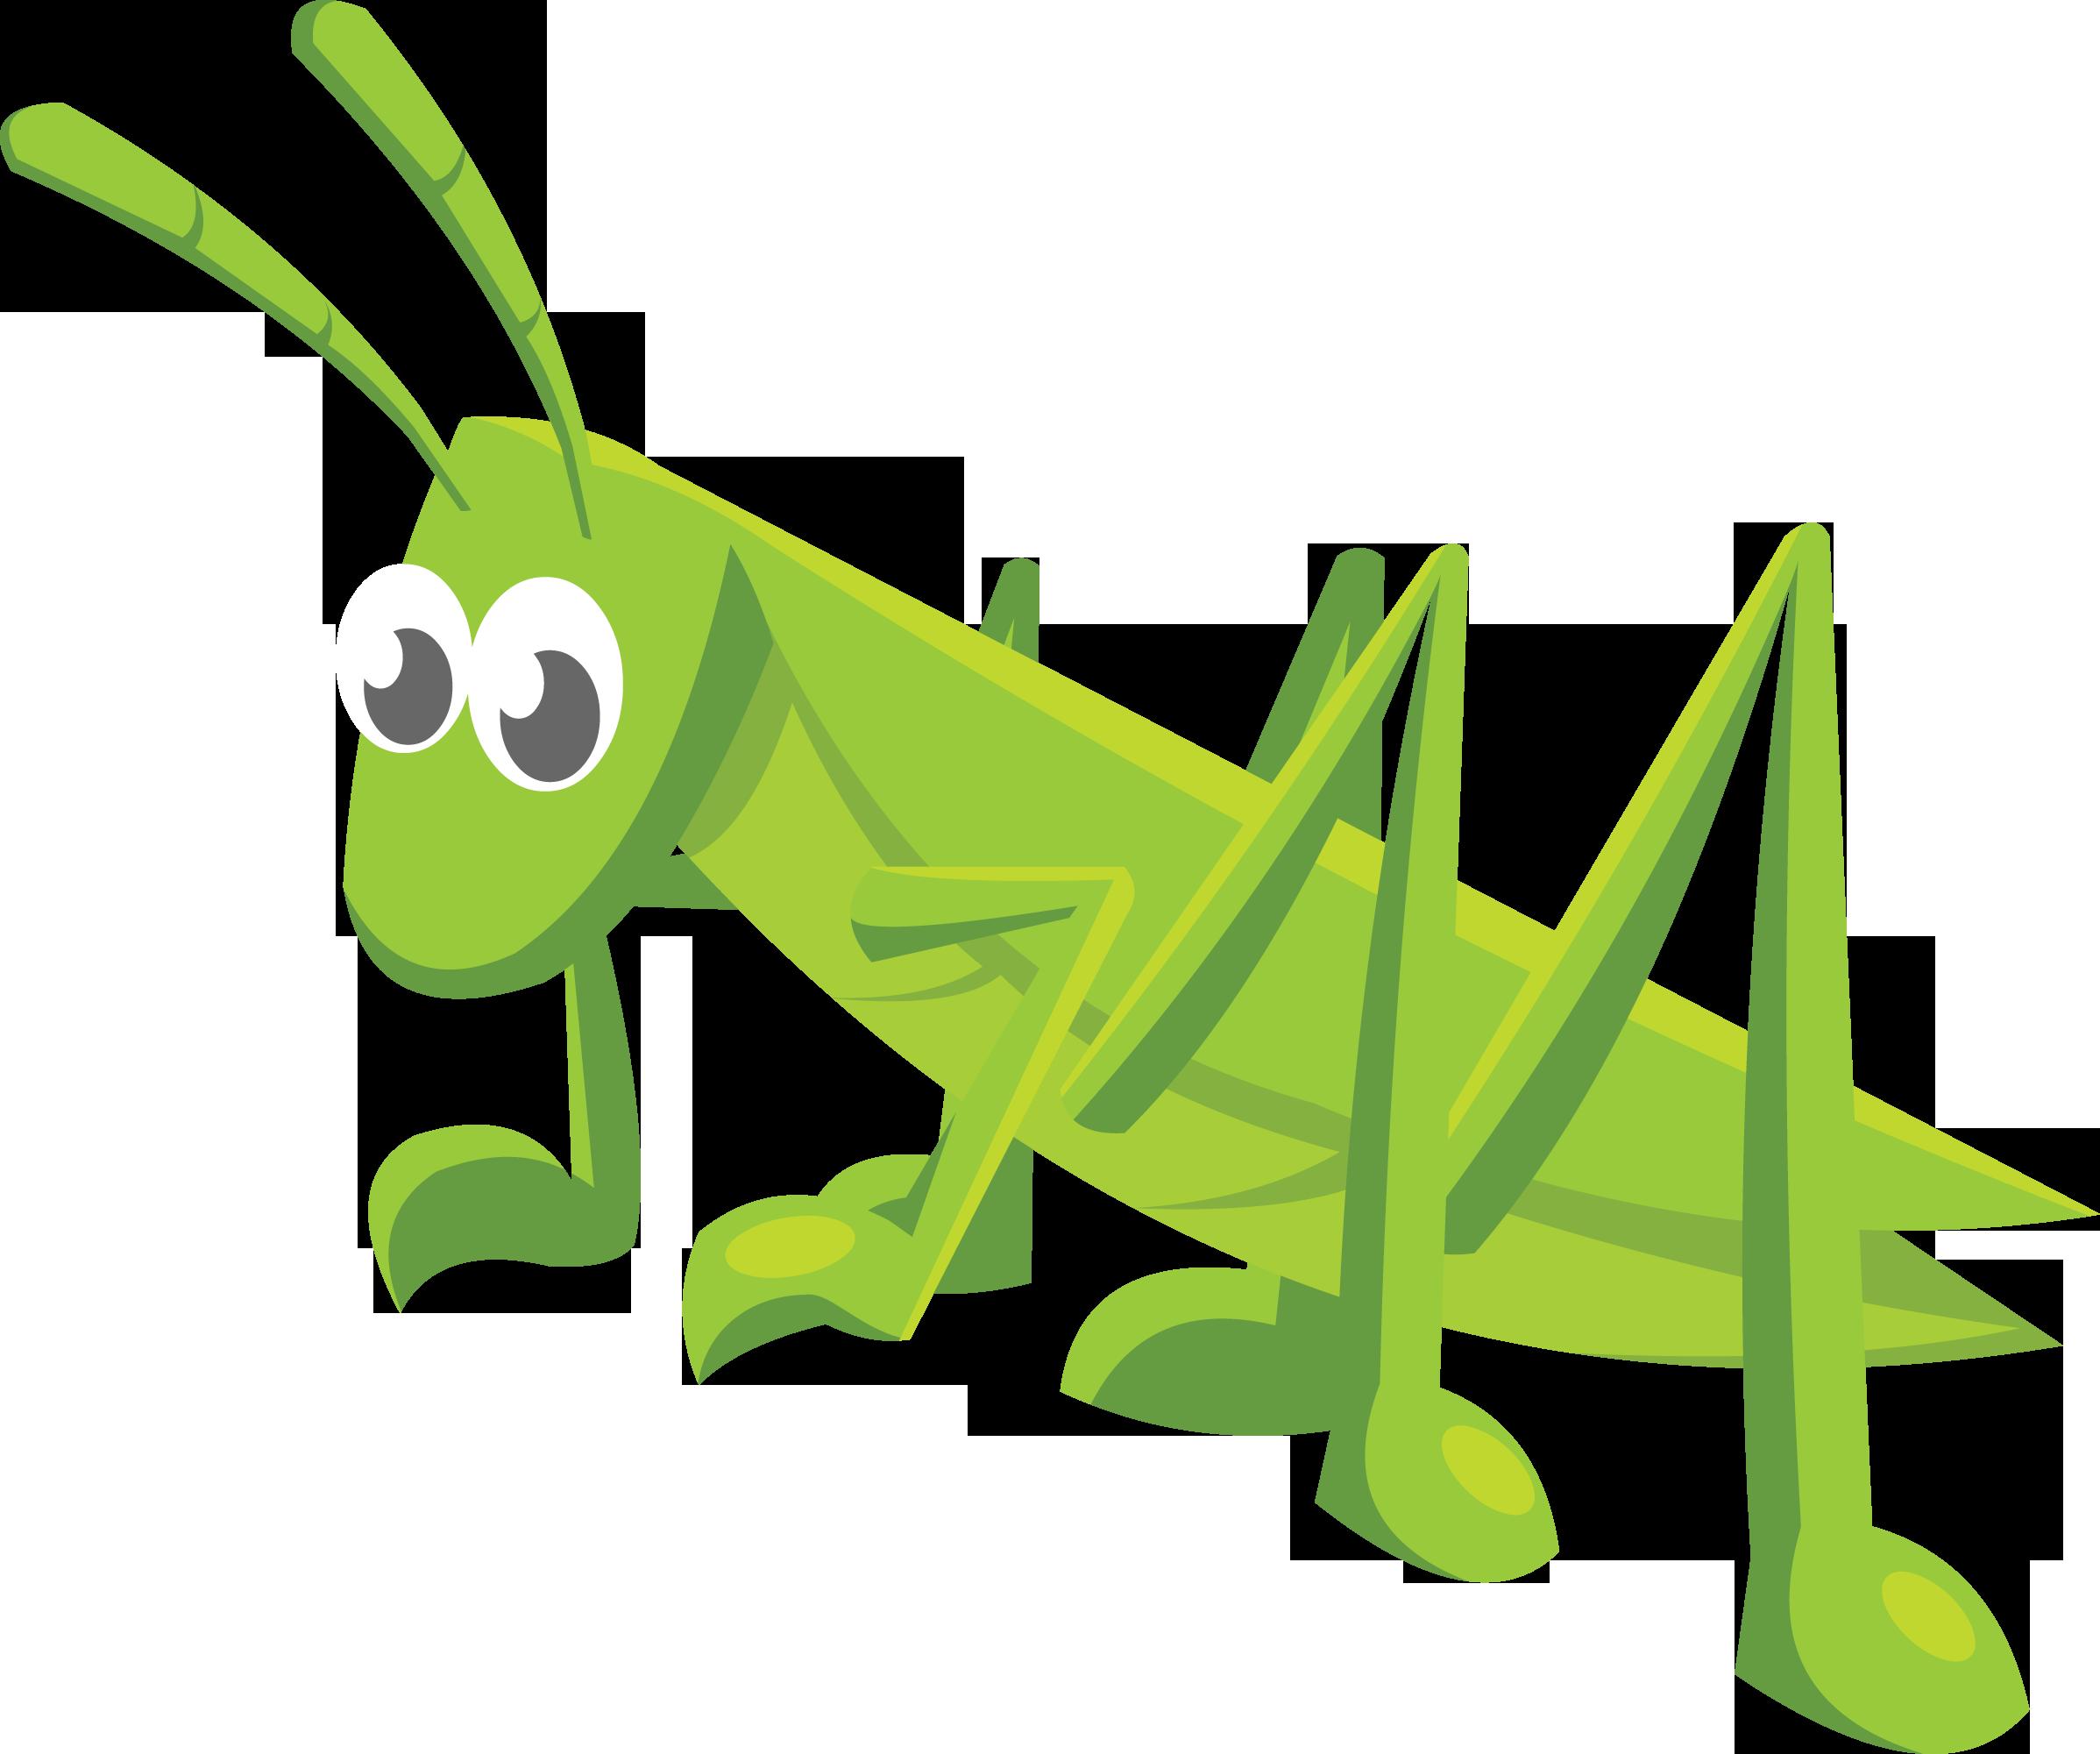 afraid-of-grasshoppers